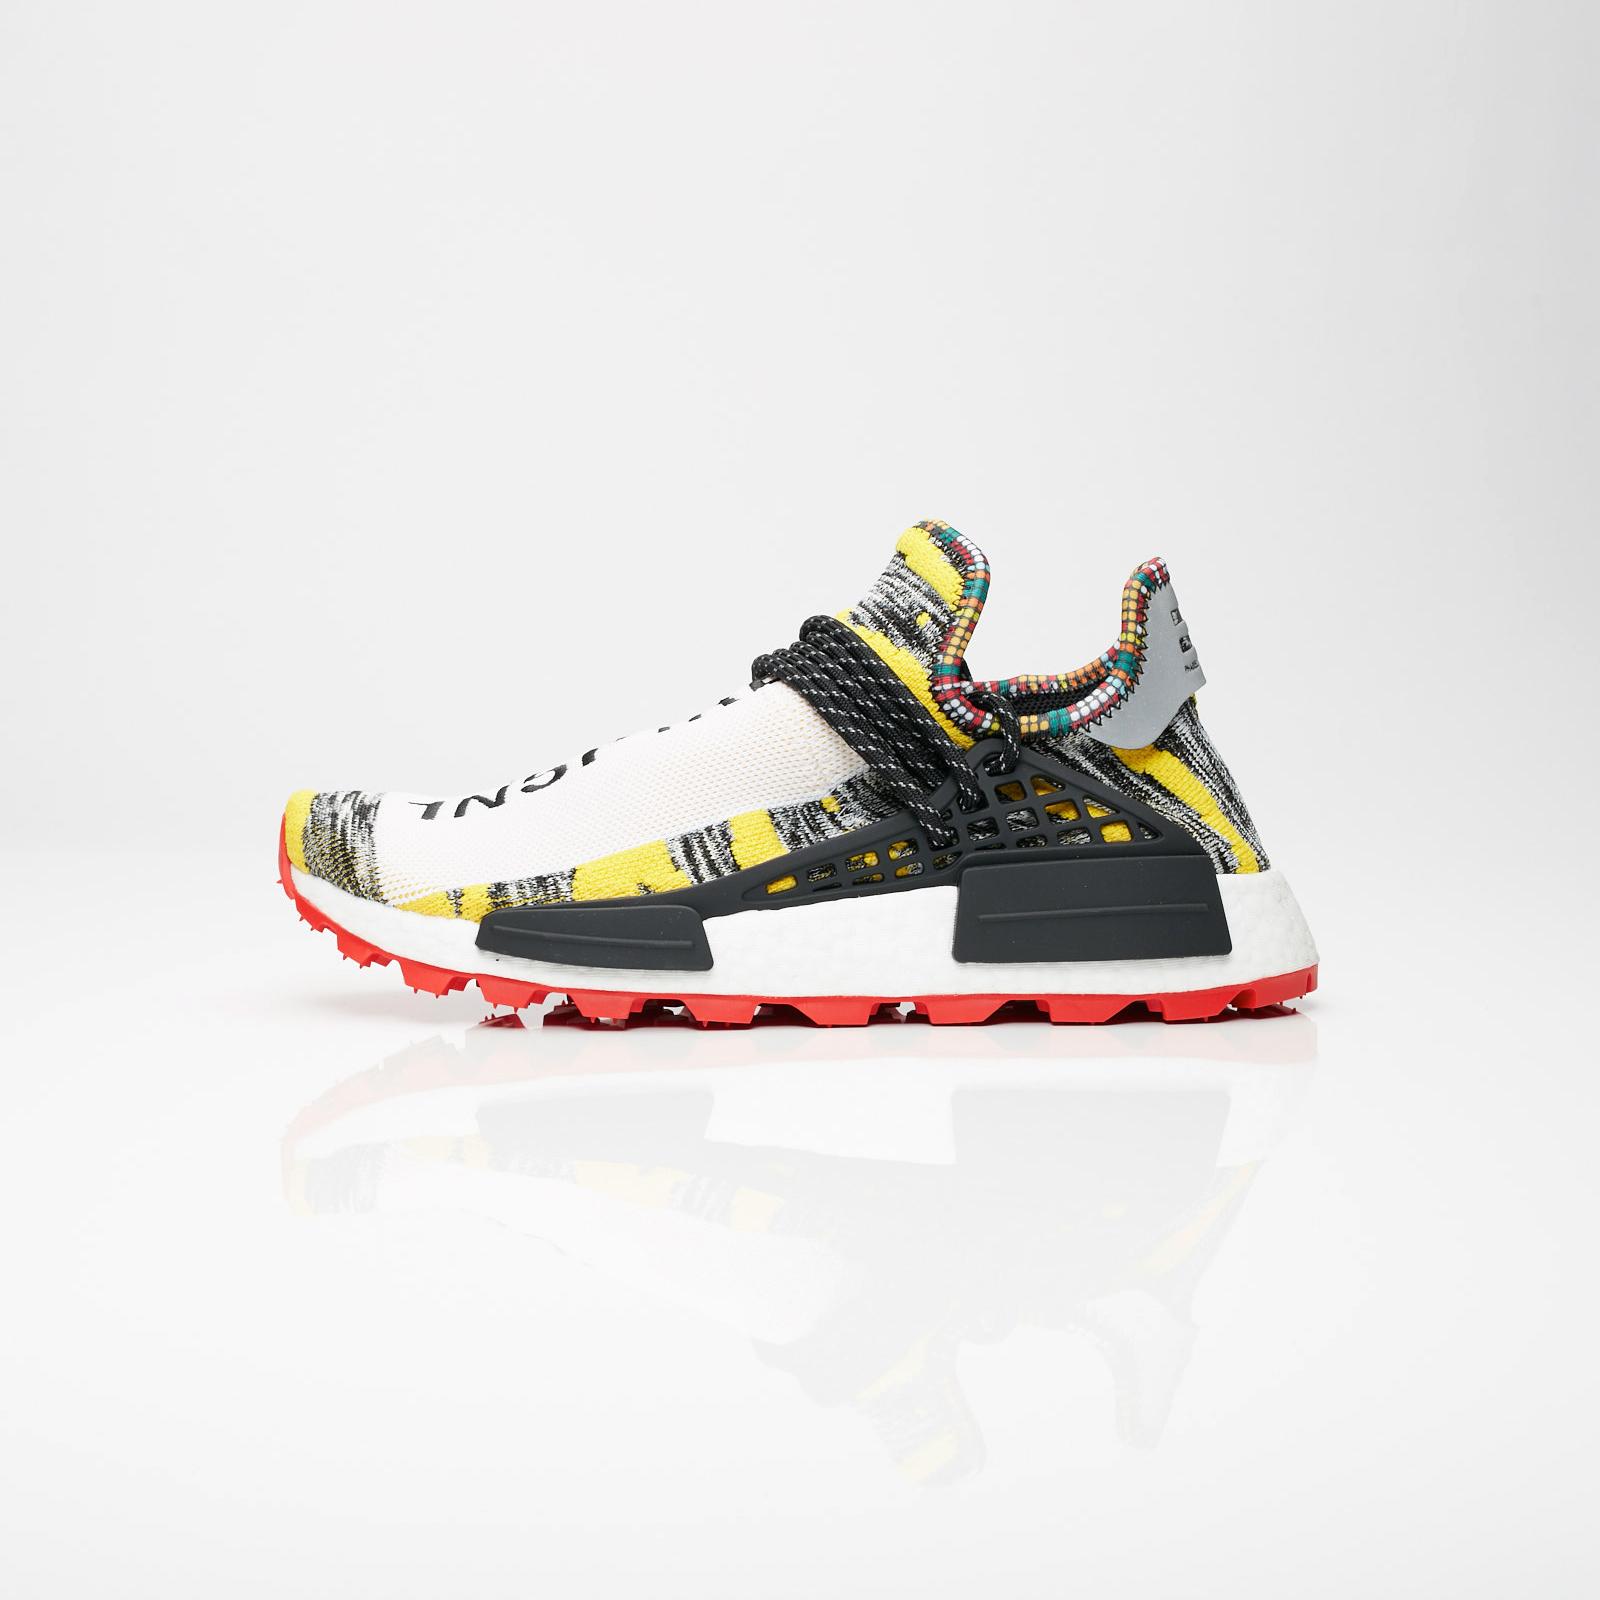 2e61c0e0b84e2 adidas Solar HU NMD x Pharrell Williams - Bb9527 - Sneakersnstuff ...